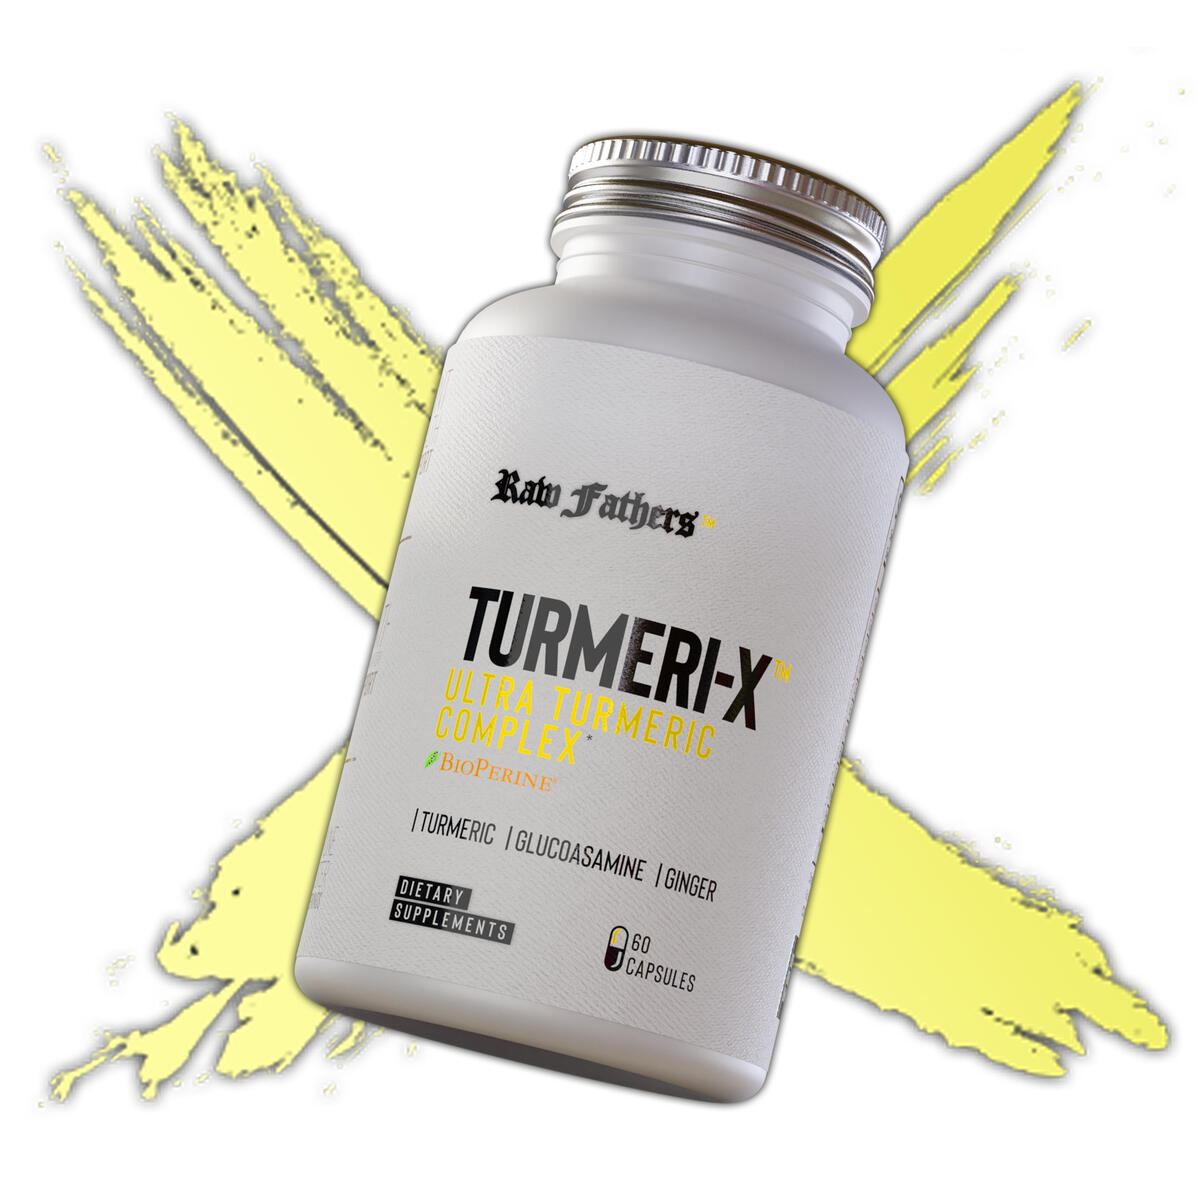 TURMERI-X™ Advanced Turmeric Curcumin with Bioperine Complex by Raw Fathers | Anti Inflammatory Supplement -Turmeric Curcumin - Ginger - Bromelain | Joint Support Glucosamine Chondroitin MSM & More